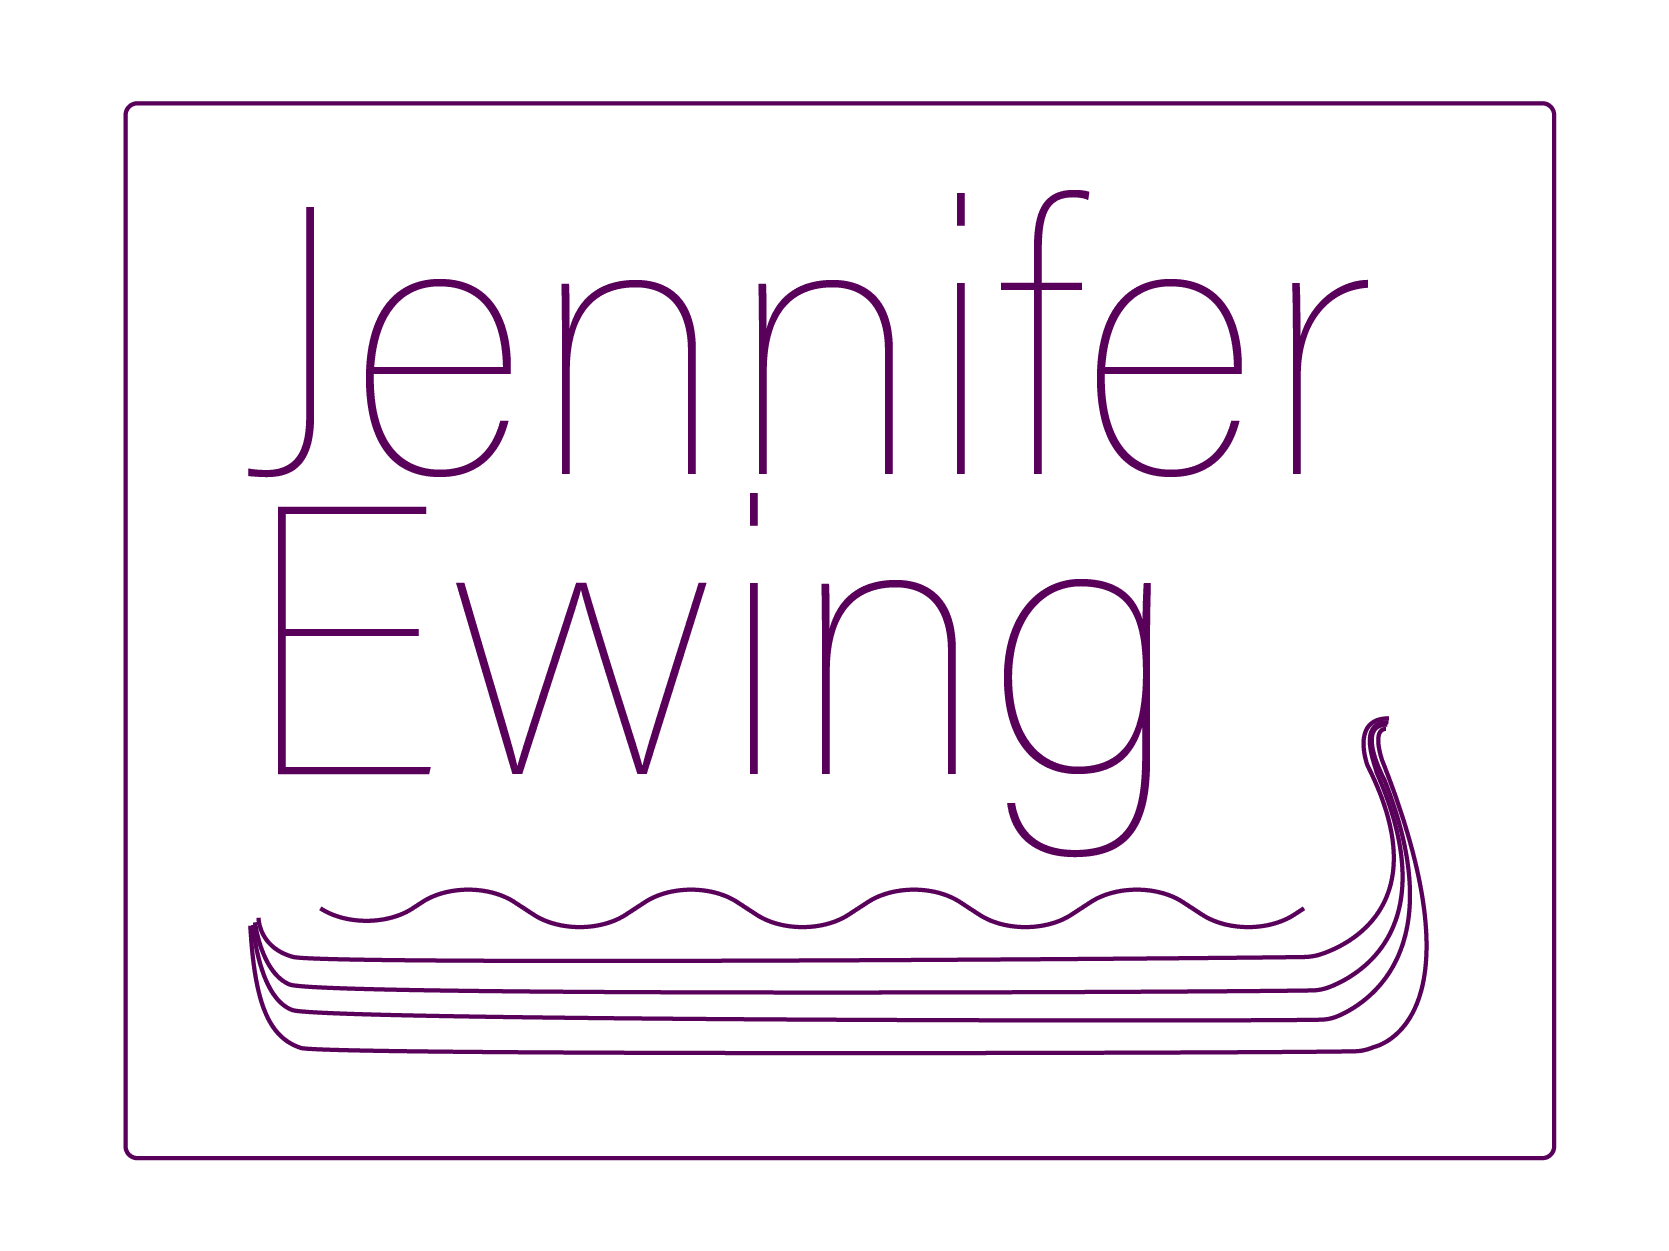 jennifer Ewing SpiritBoatist